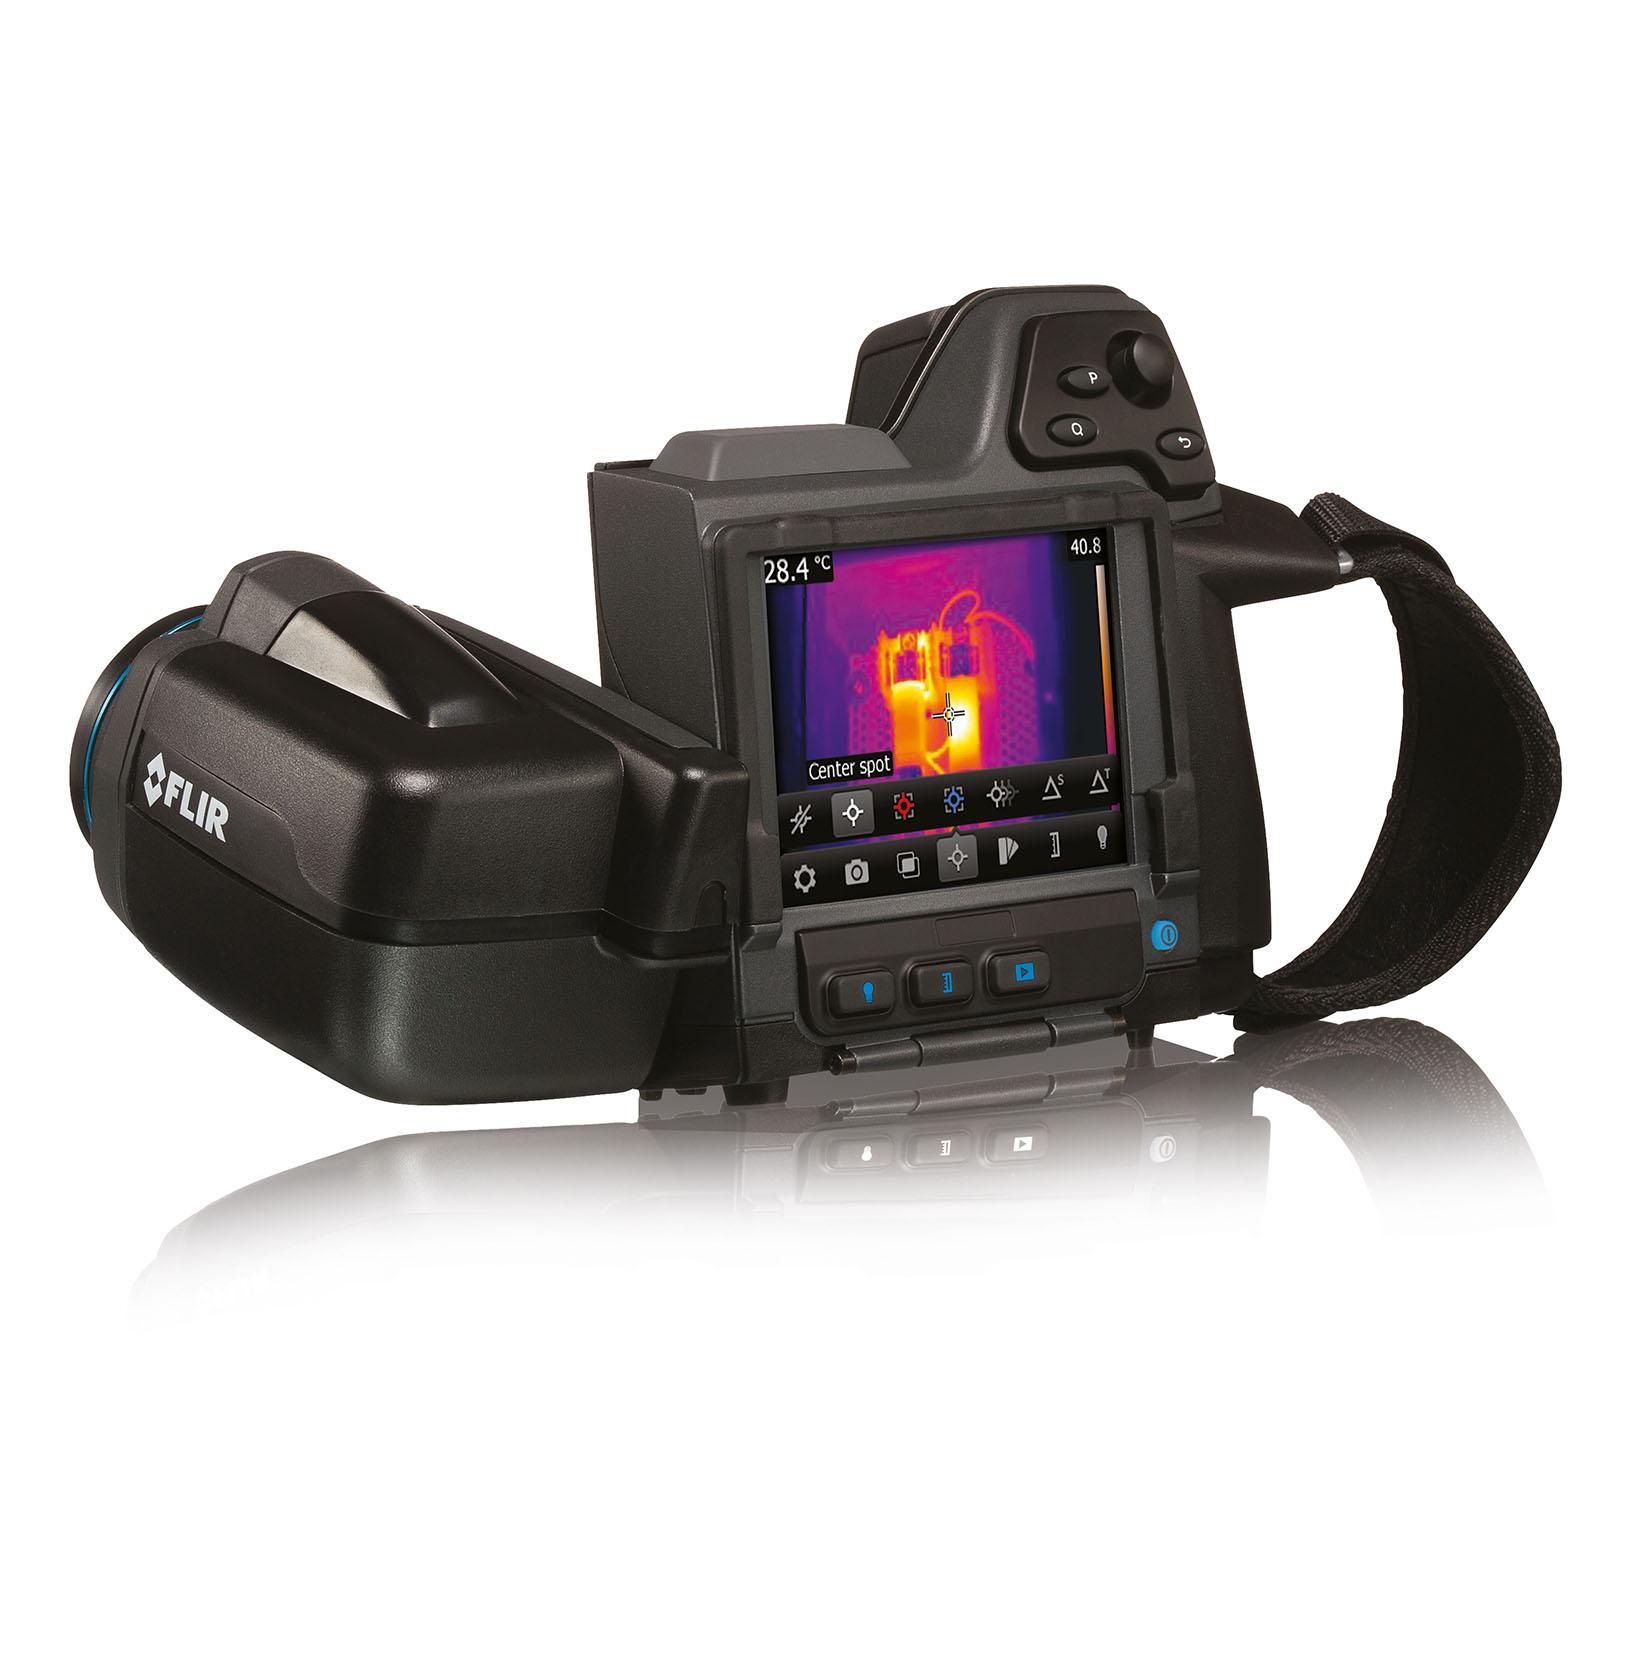 flir t440 express instrument hire rh expresshire net flir t420 manual FLIR T420 Infrared Camera